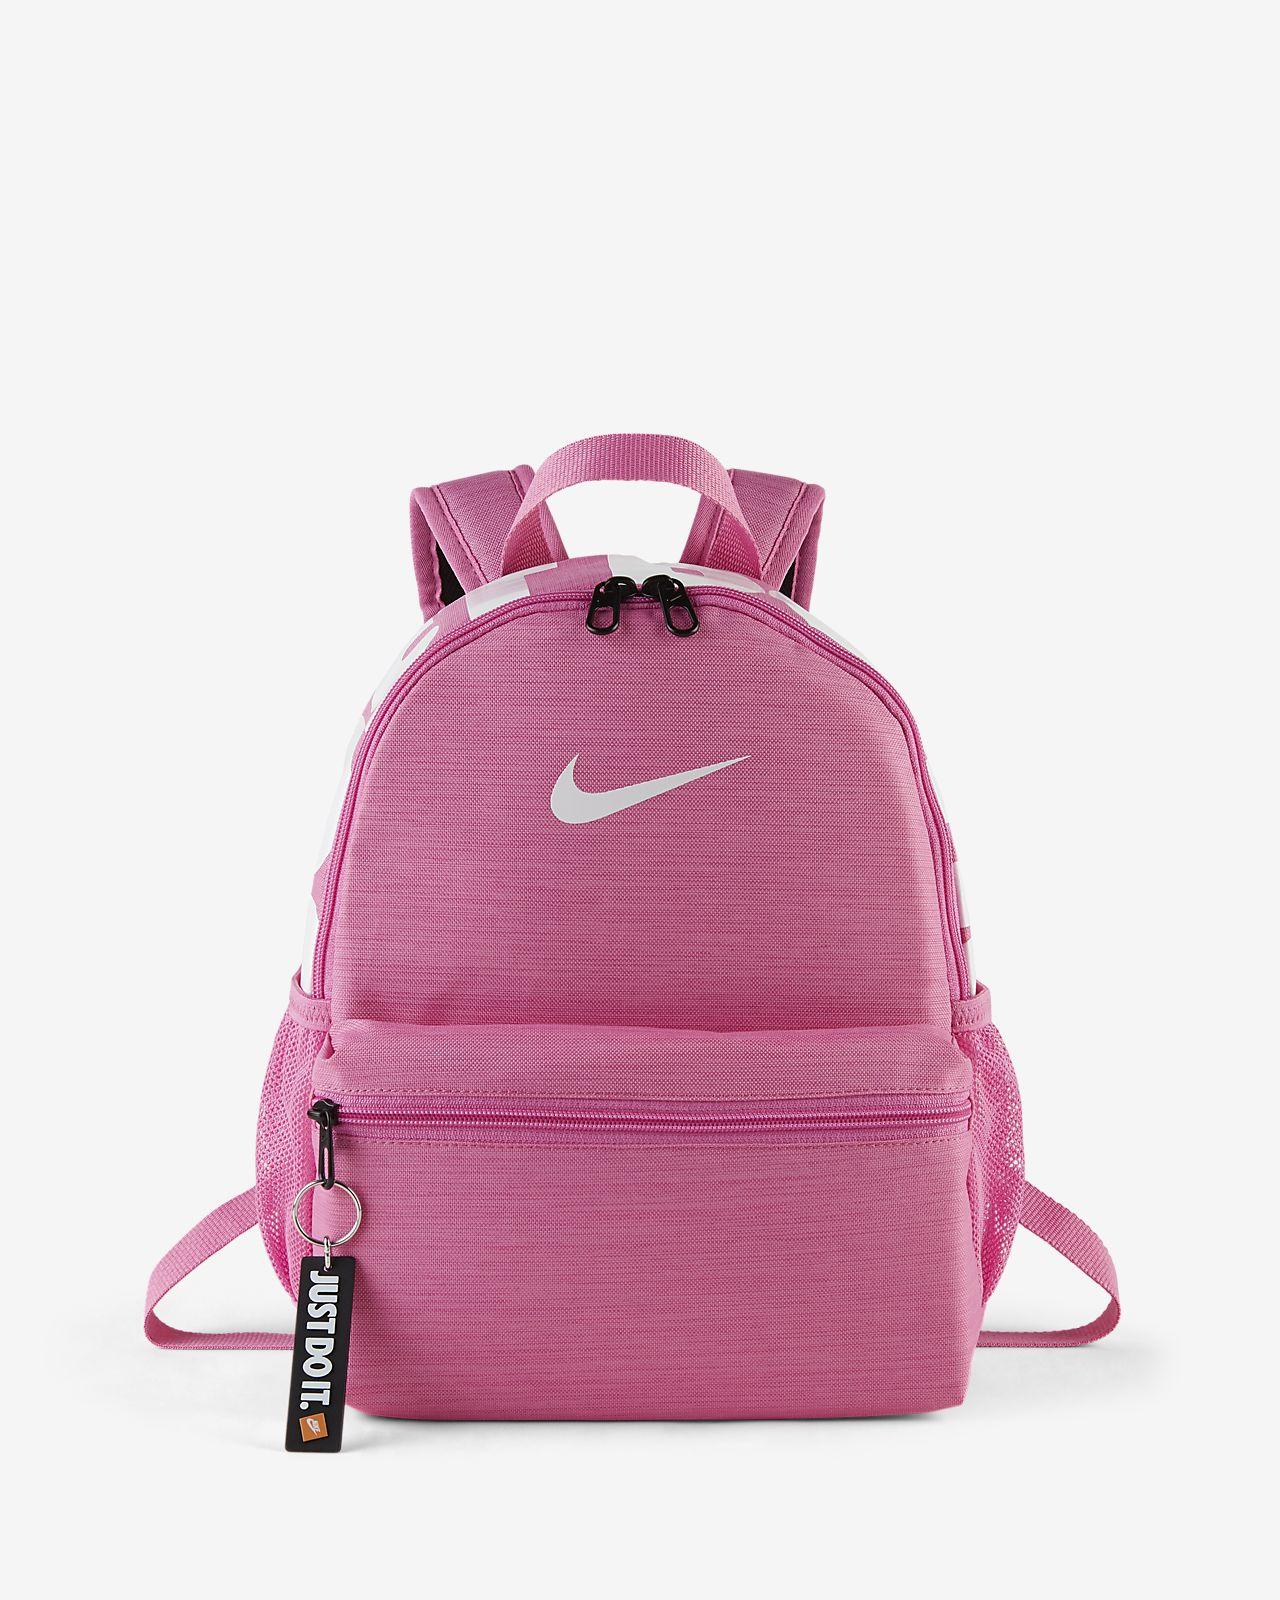 Nike Brasilia Just Do It Mochila (mini) - Niño/a